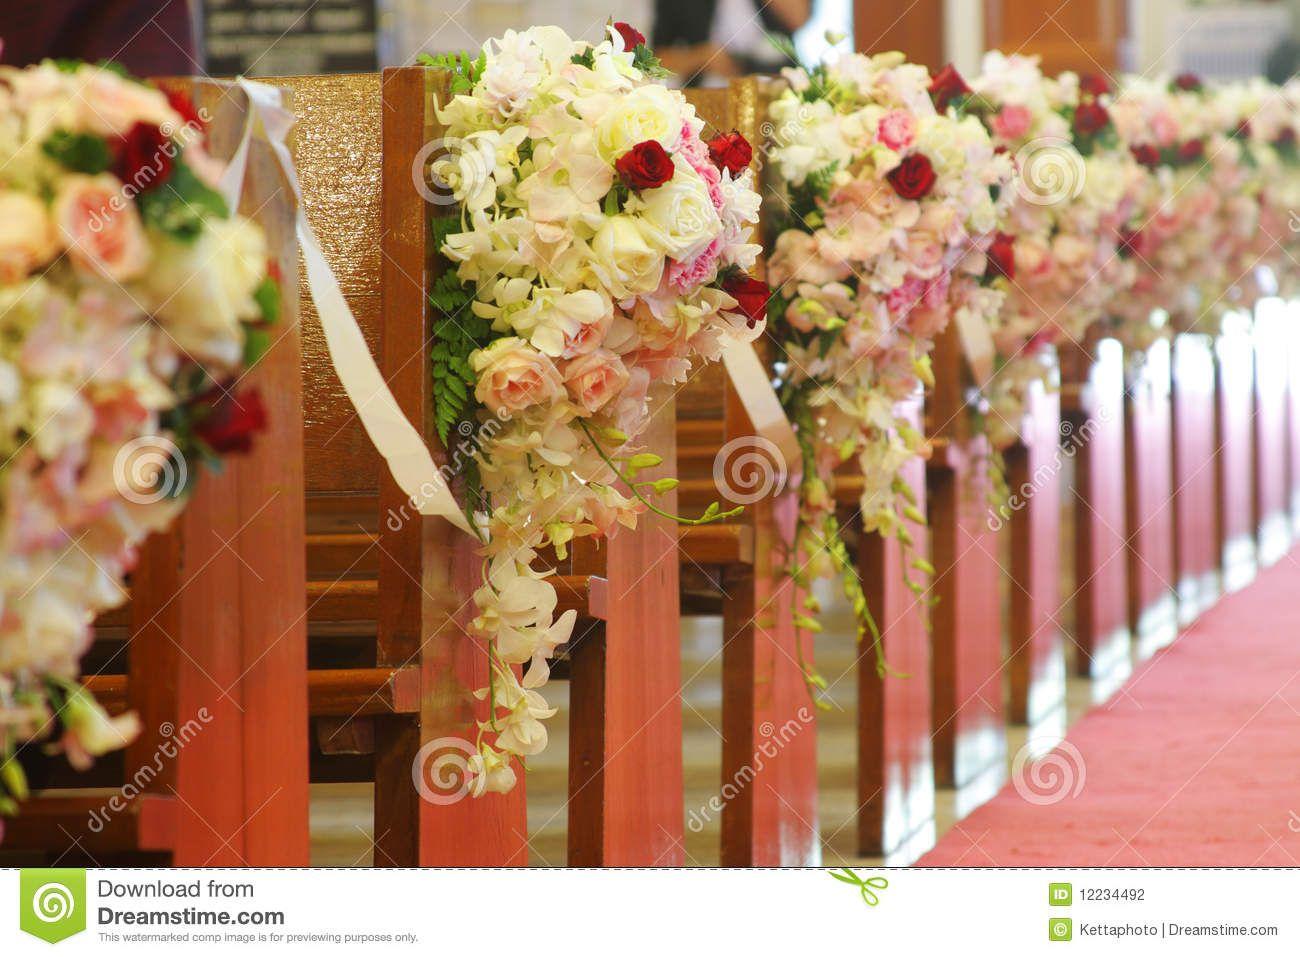 Wedding decorations clipart  Church Pew Decorations  People In Church Pews Clipart Church pews